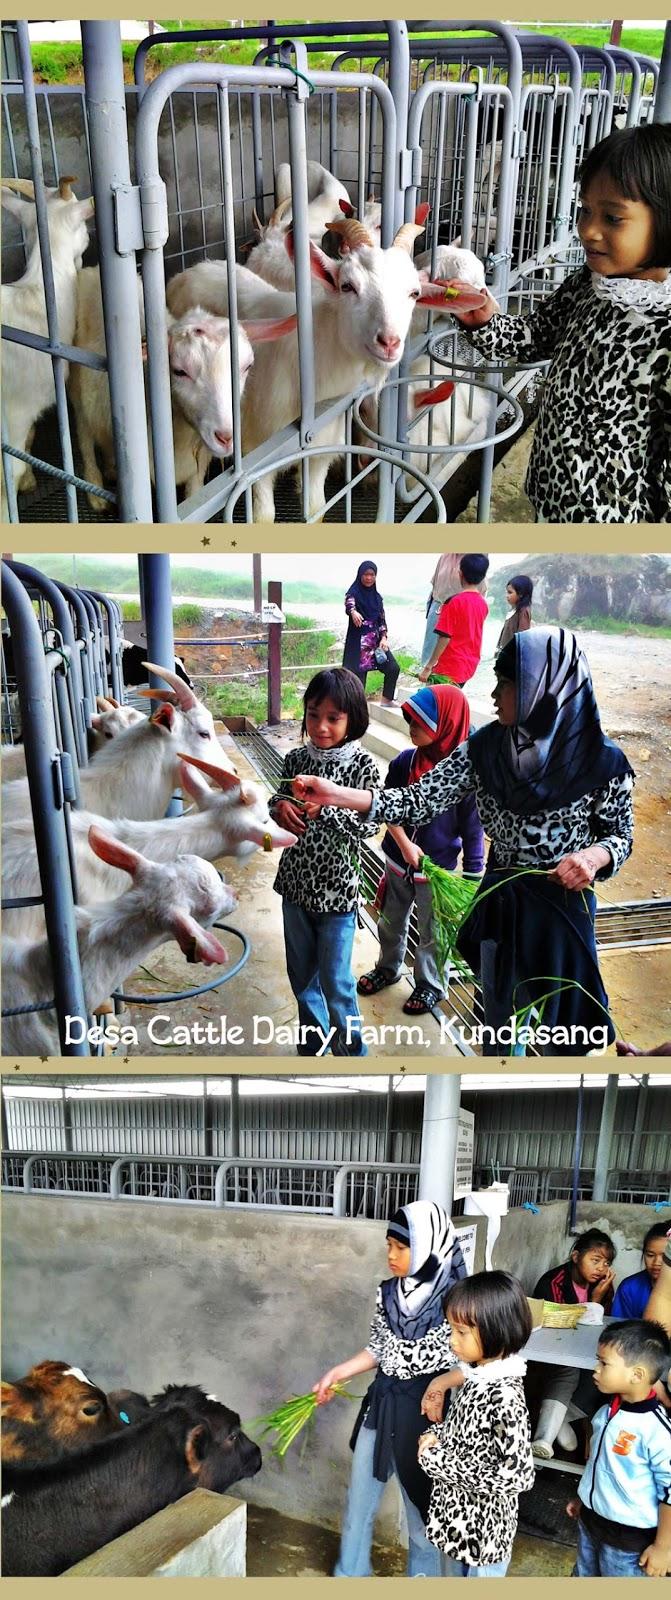 Mesilau Dairy Farm, Kundasang